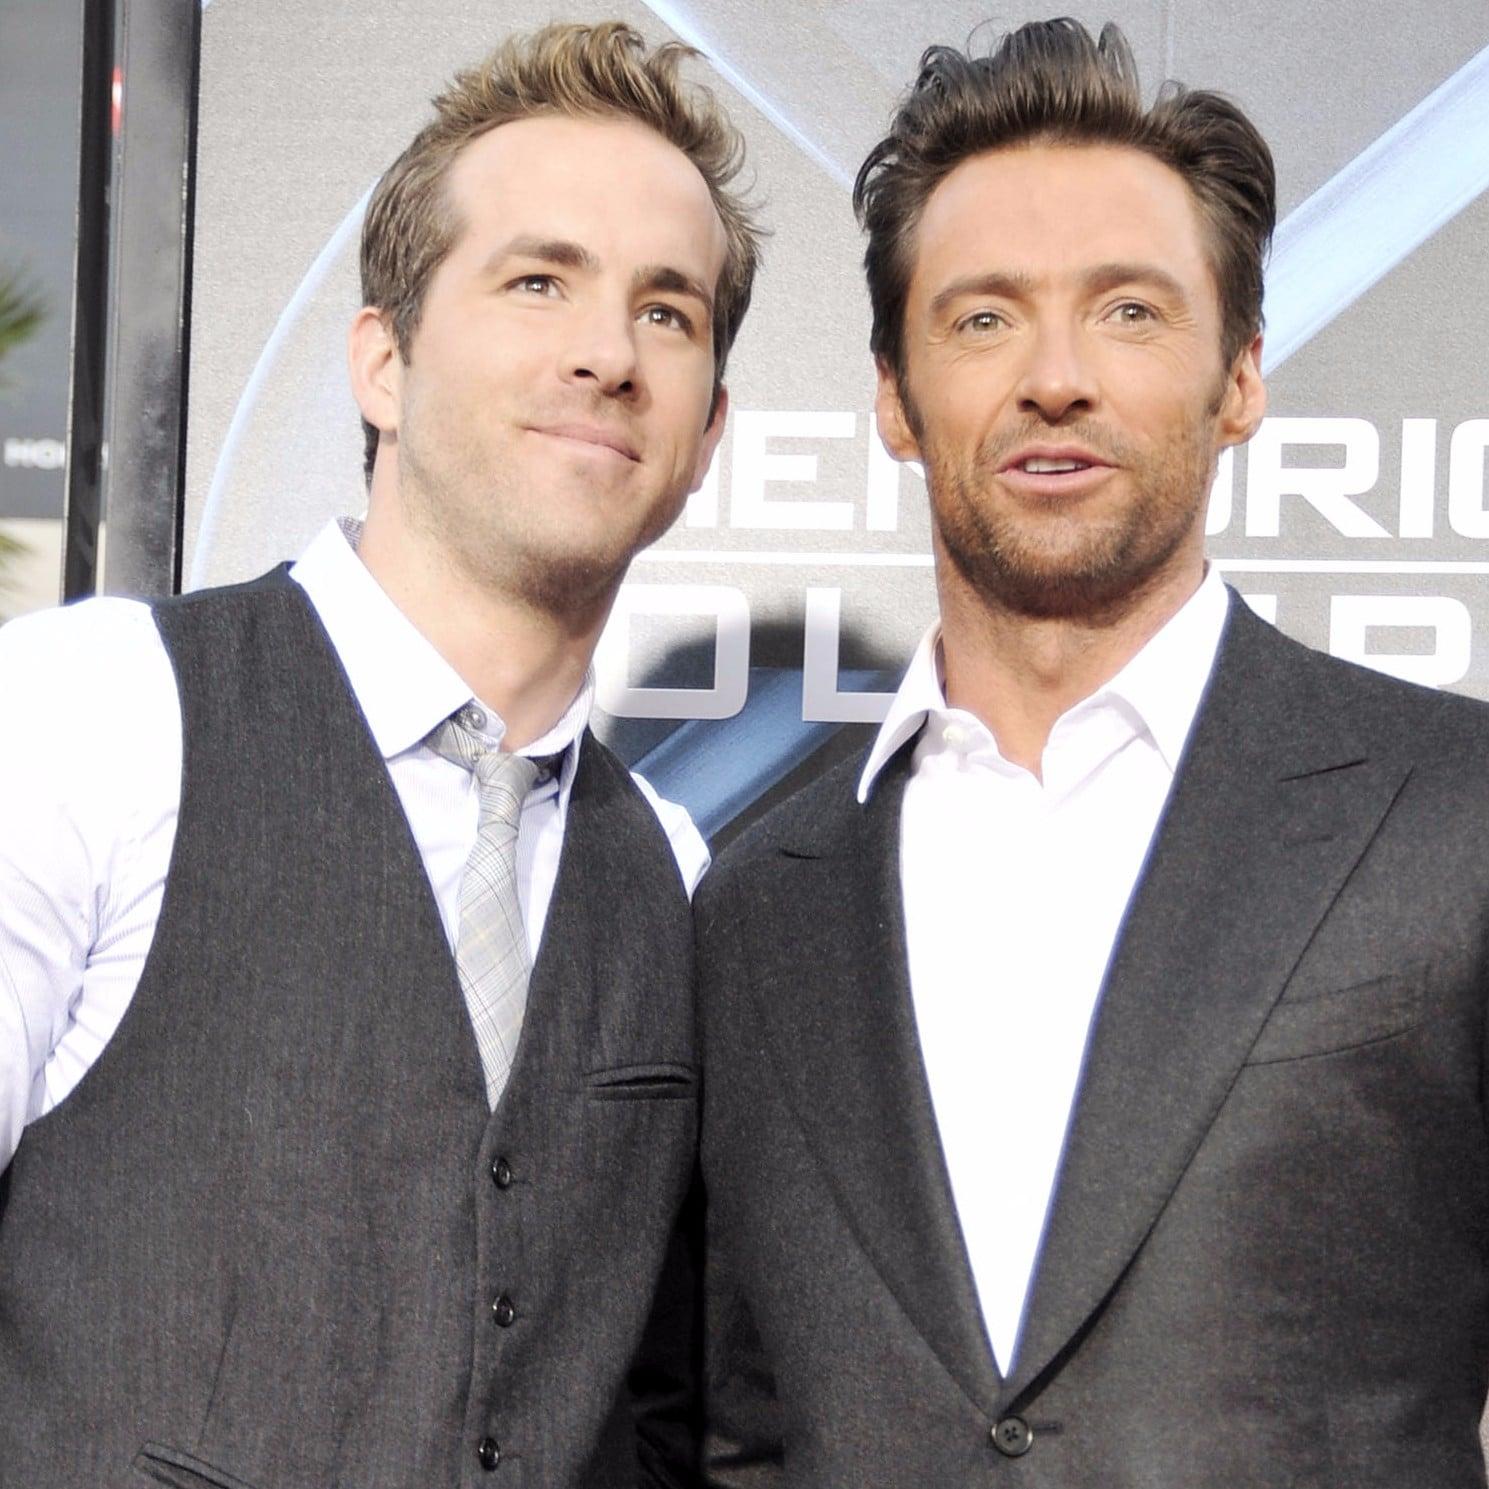 Hugh Jackman's Video About Ryan Reynolds's Walk of Fame Star ...